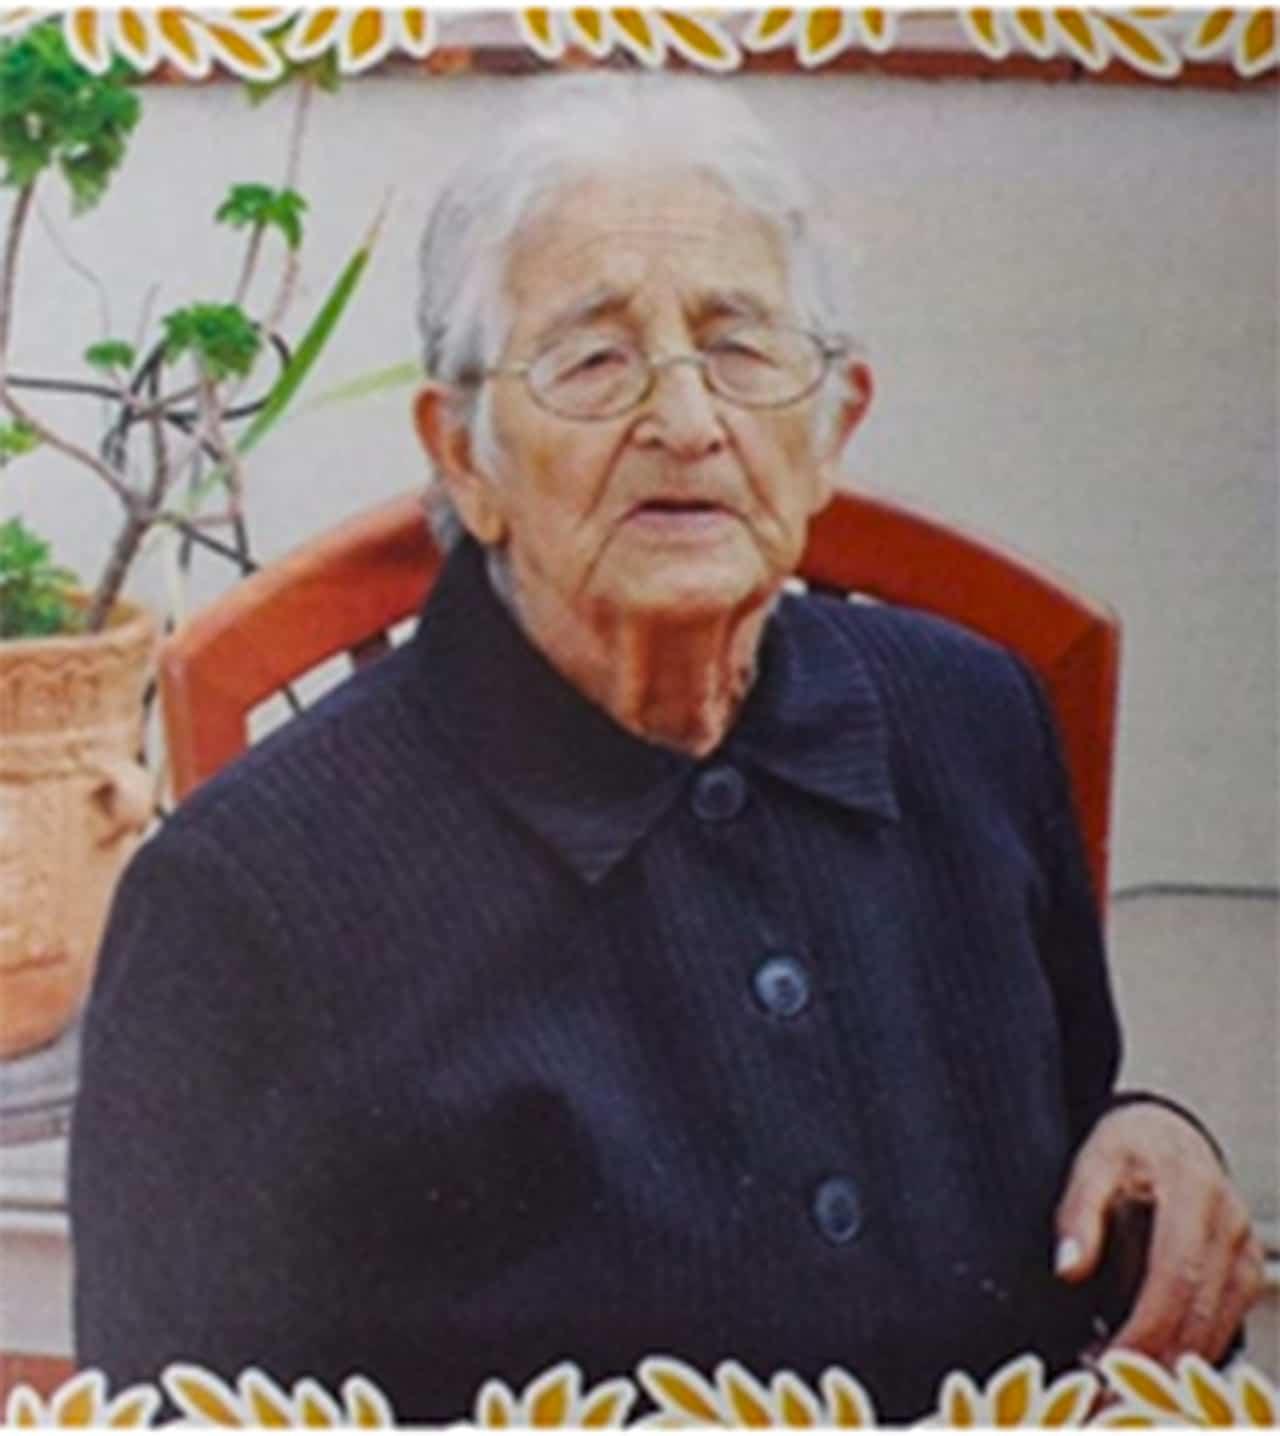 A mi madre - Luis Alfonso Espinosa Moreno 1